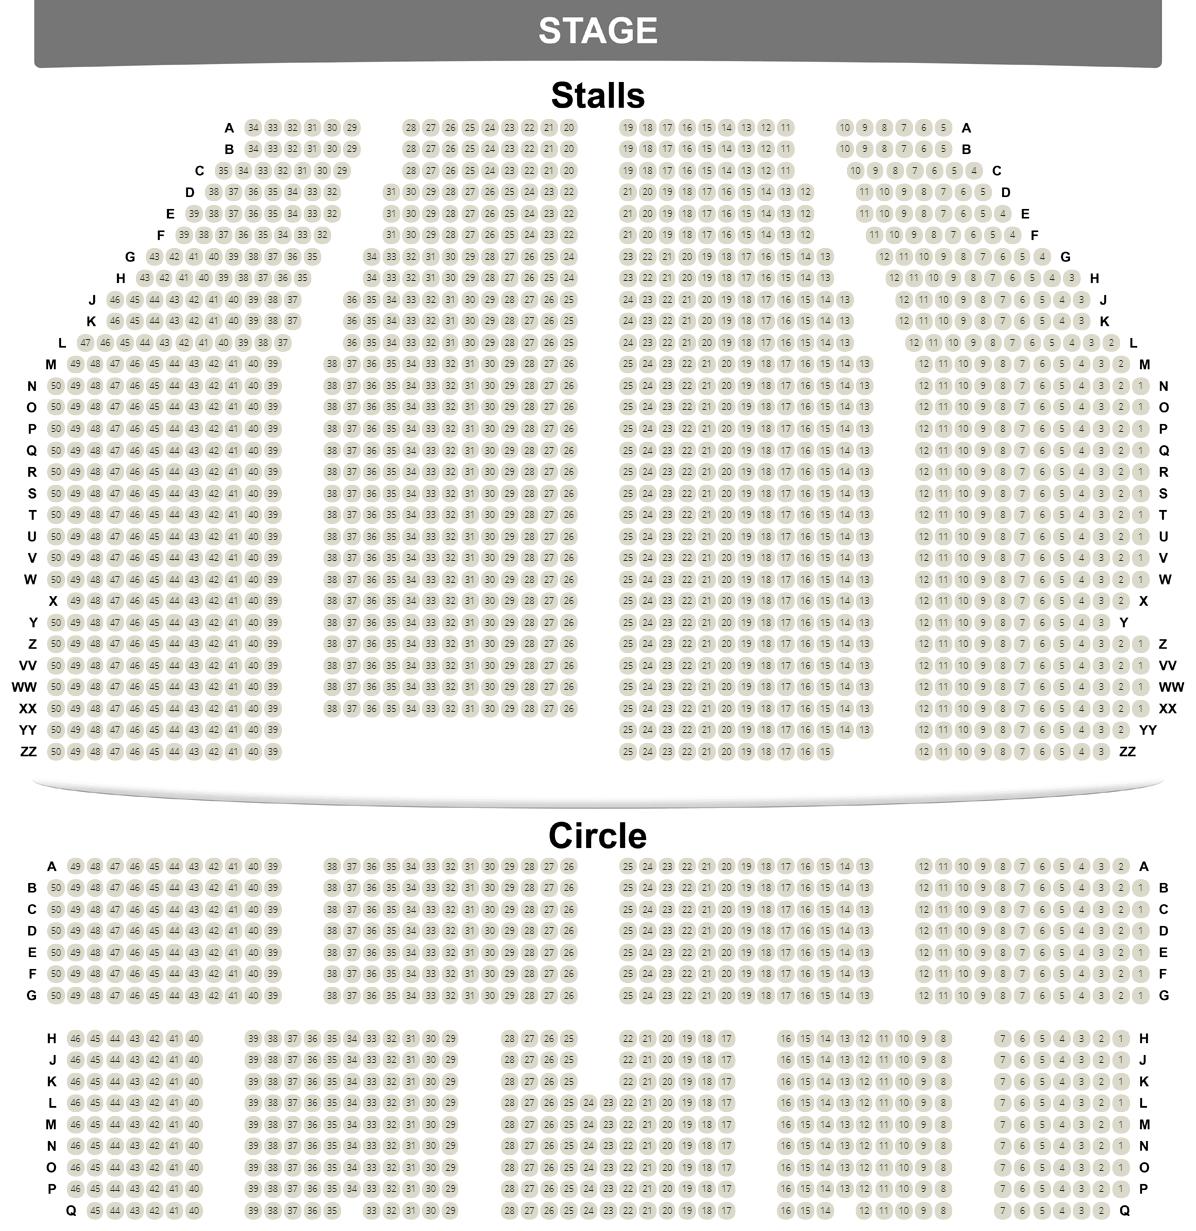 Dominion Theatre seating plan